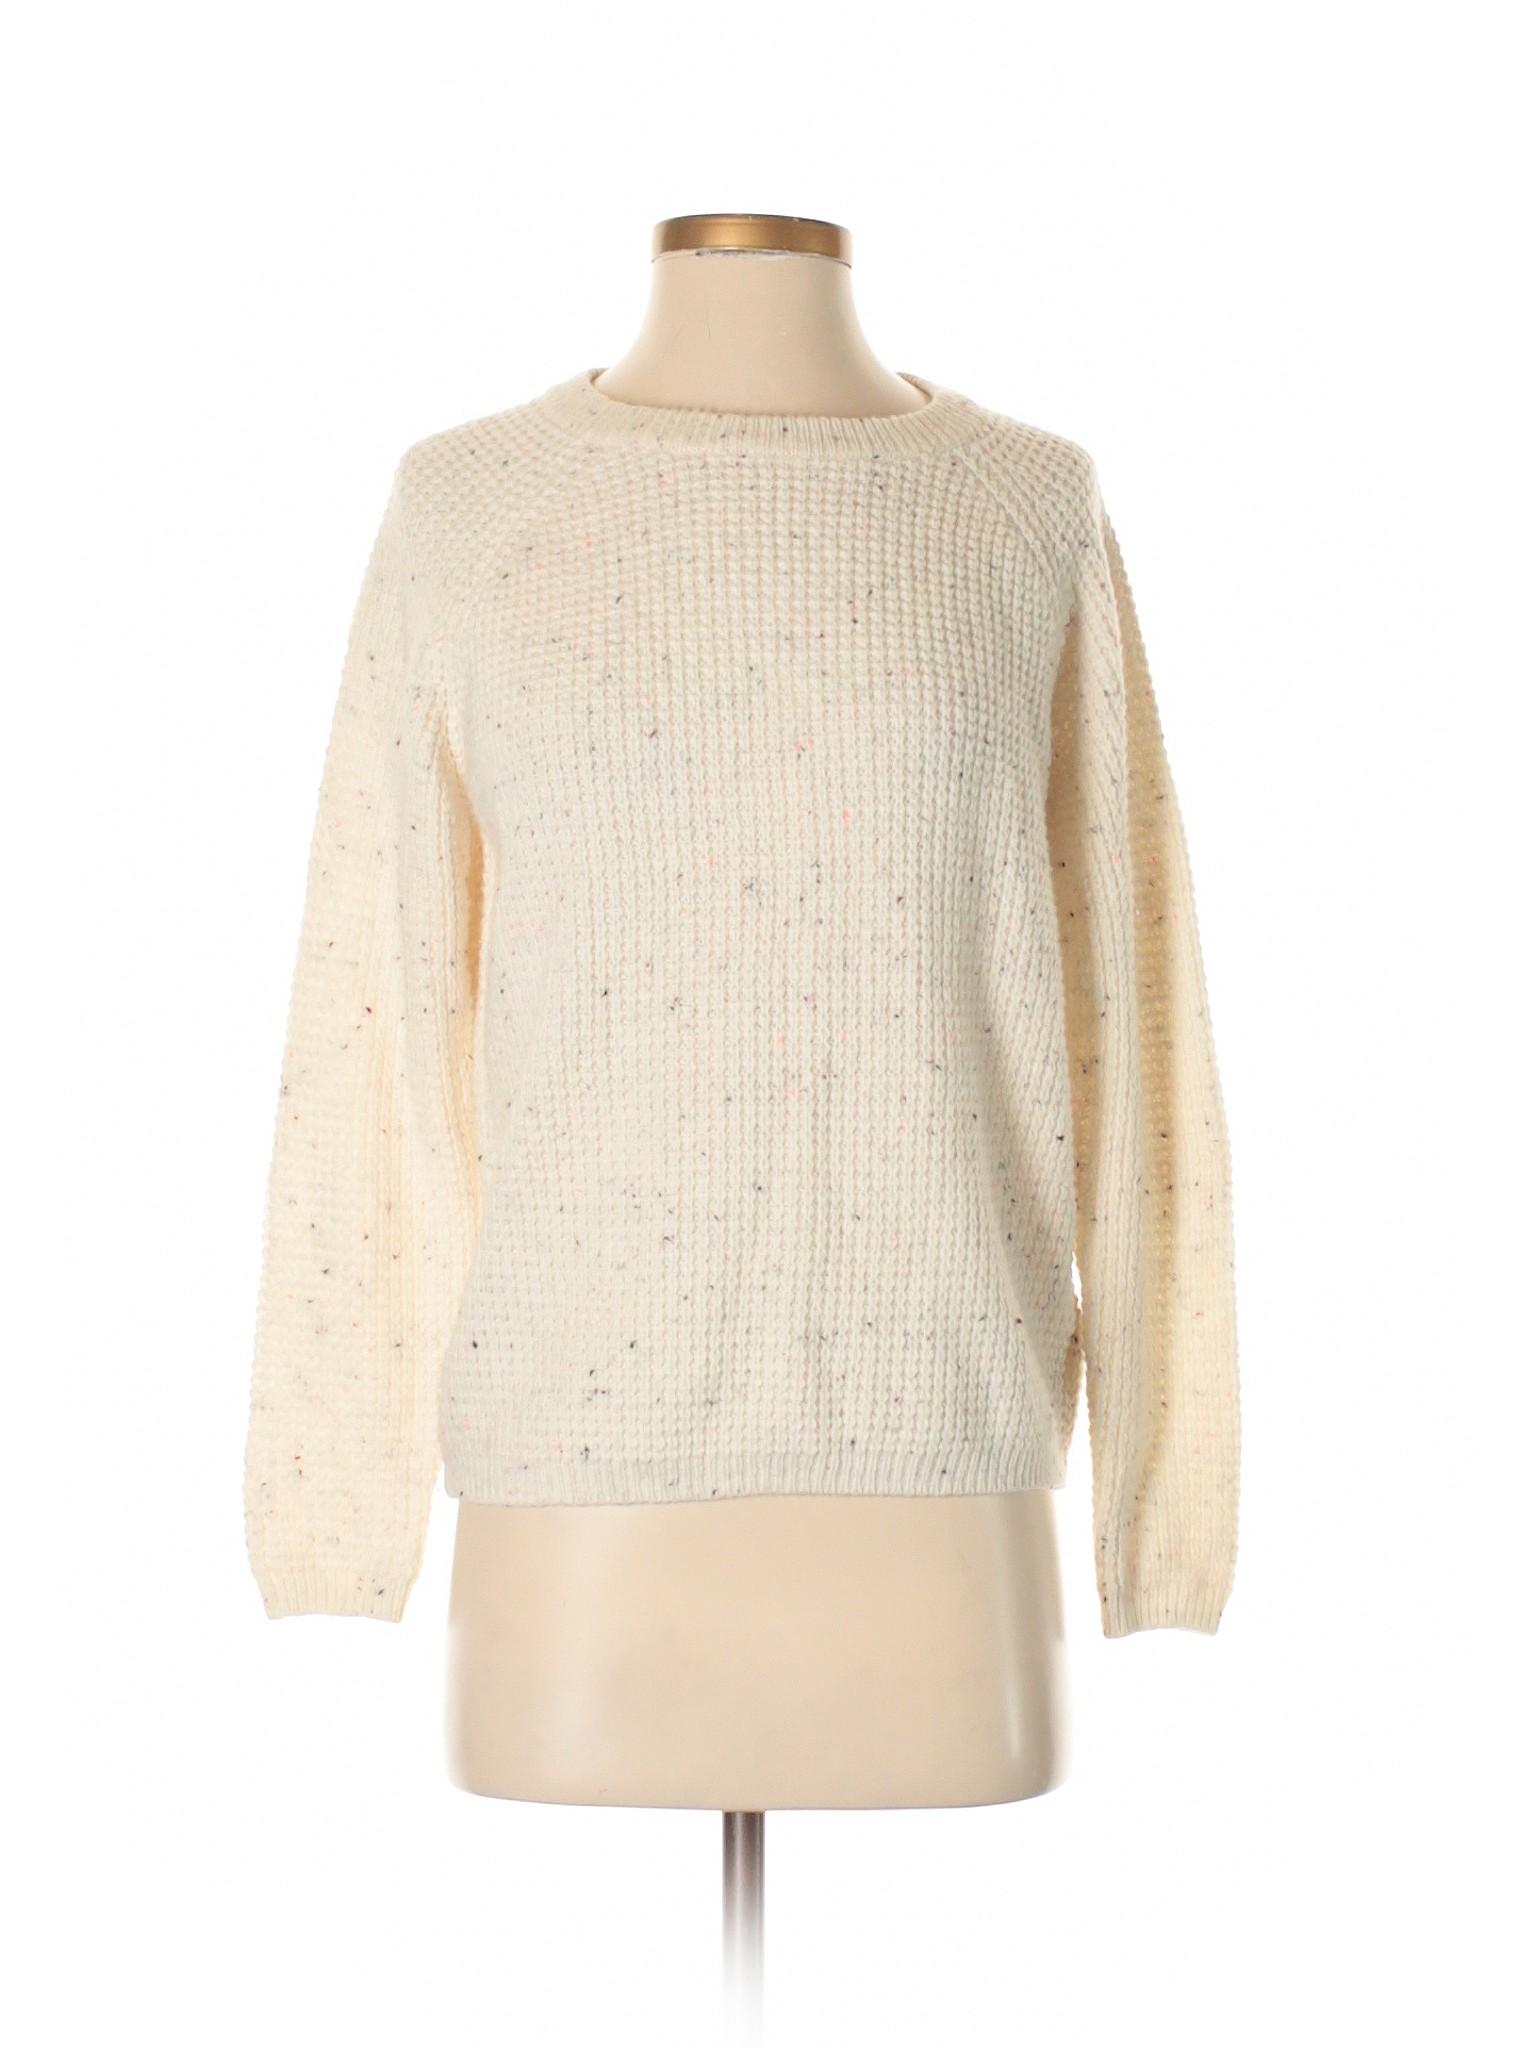 Boutique Sweater ASOS Boutique winter winter ASOS Pullover 01YxWBq